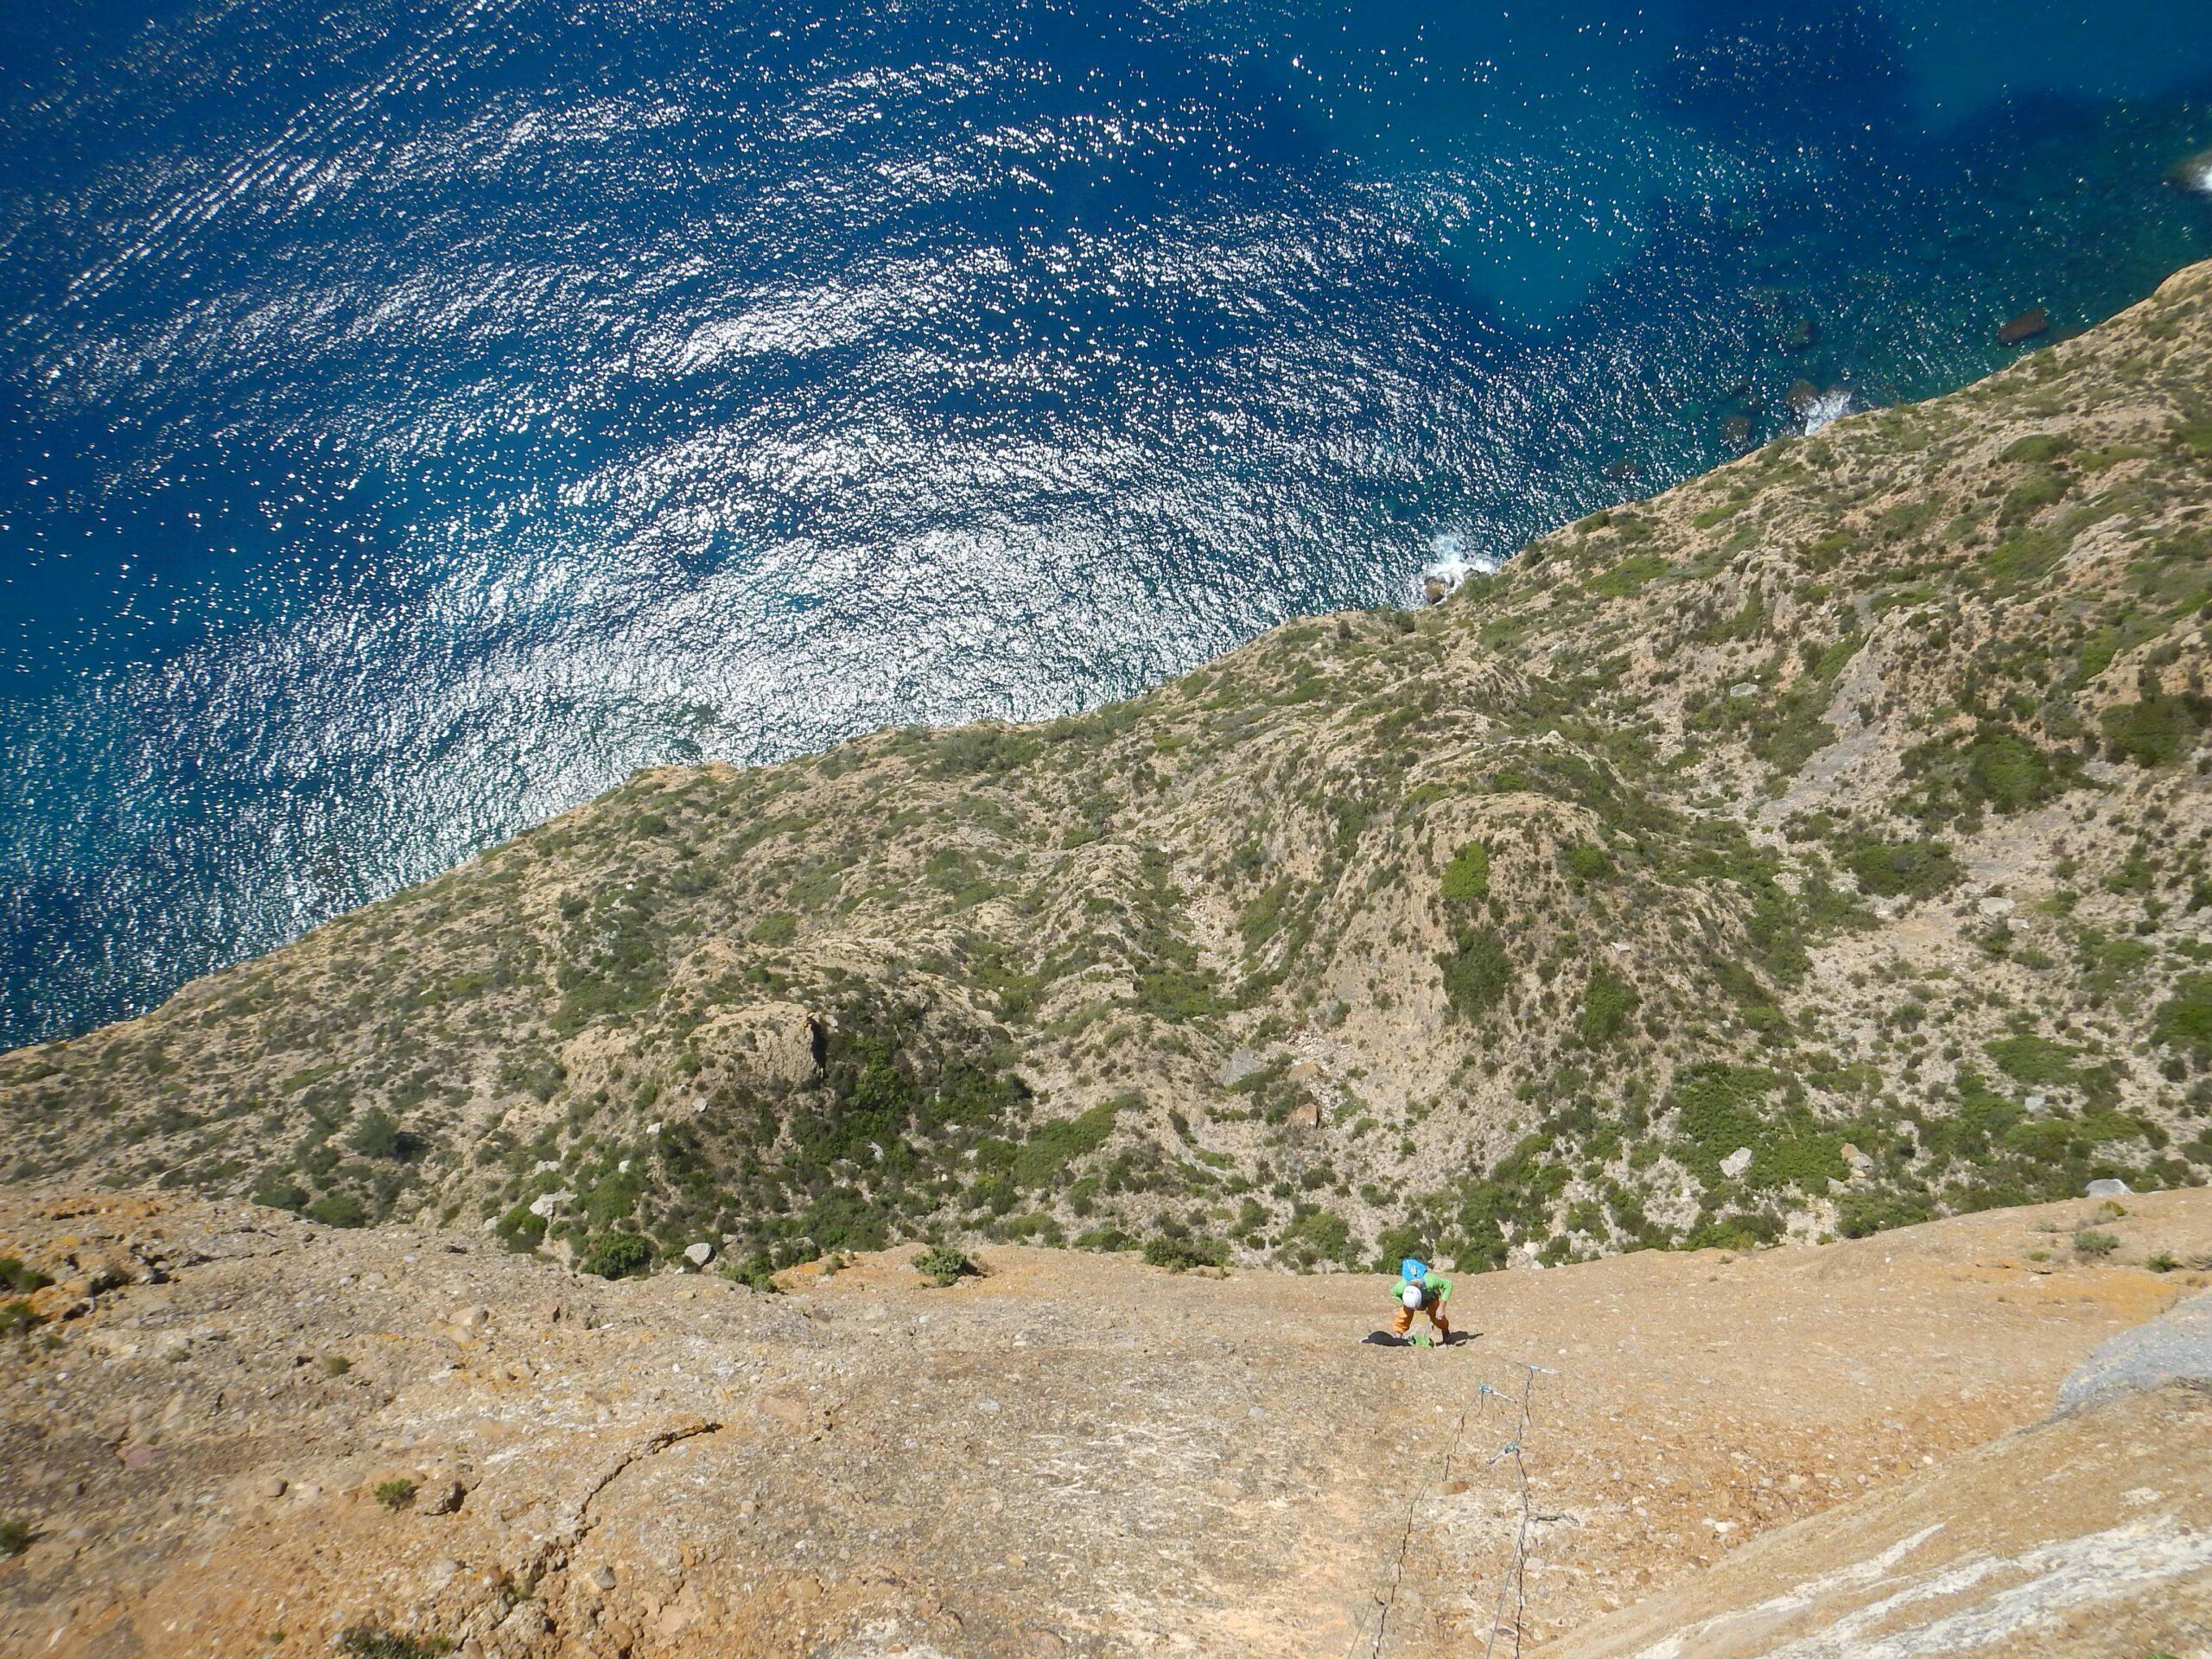 Grande voie Cap Canaille, Marseille